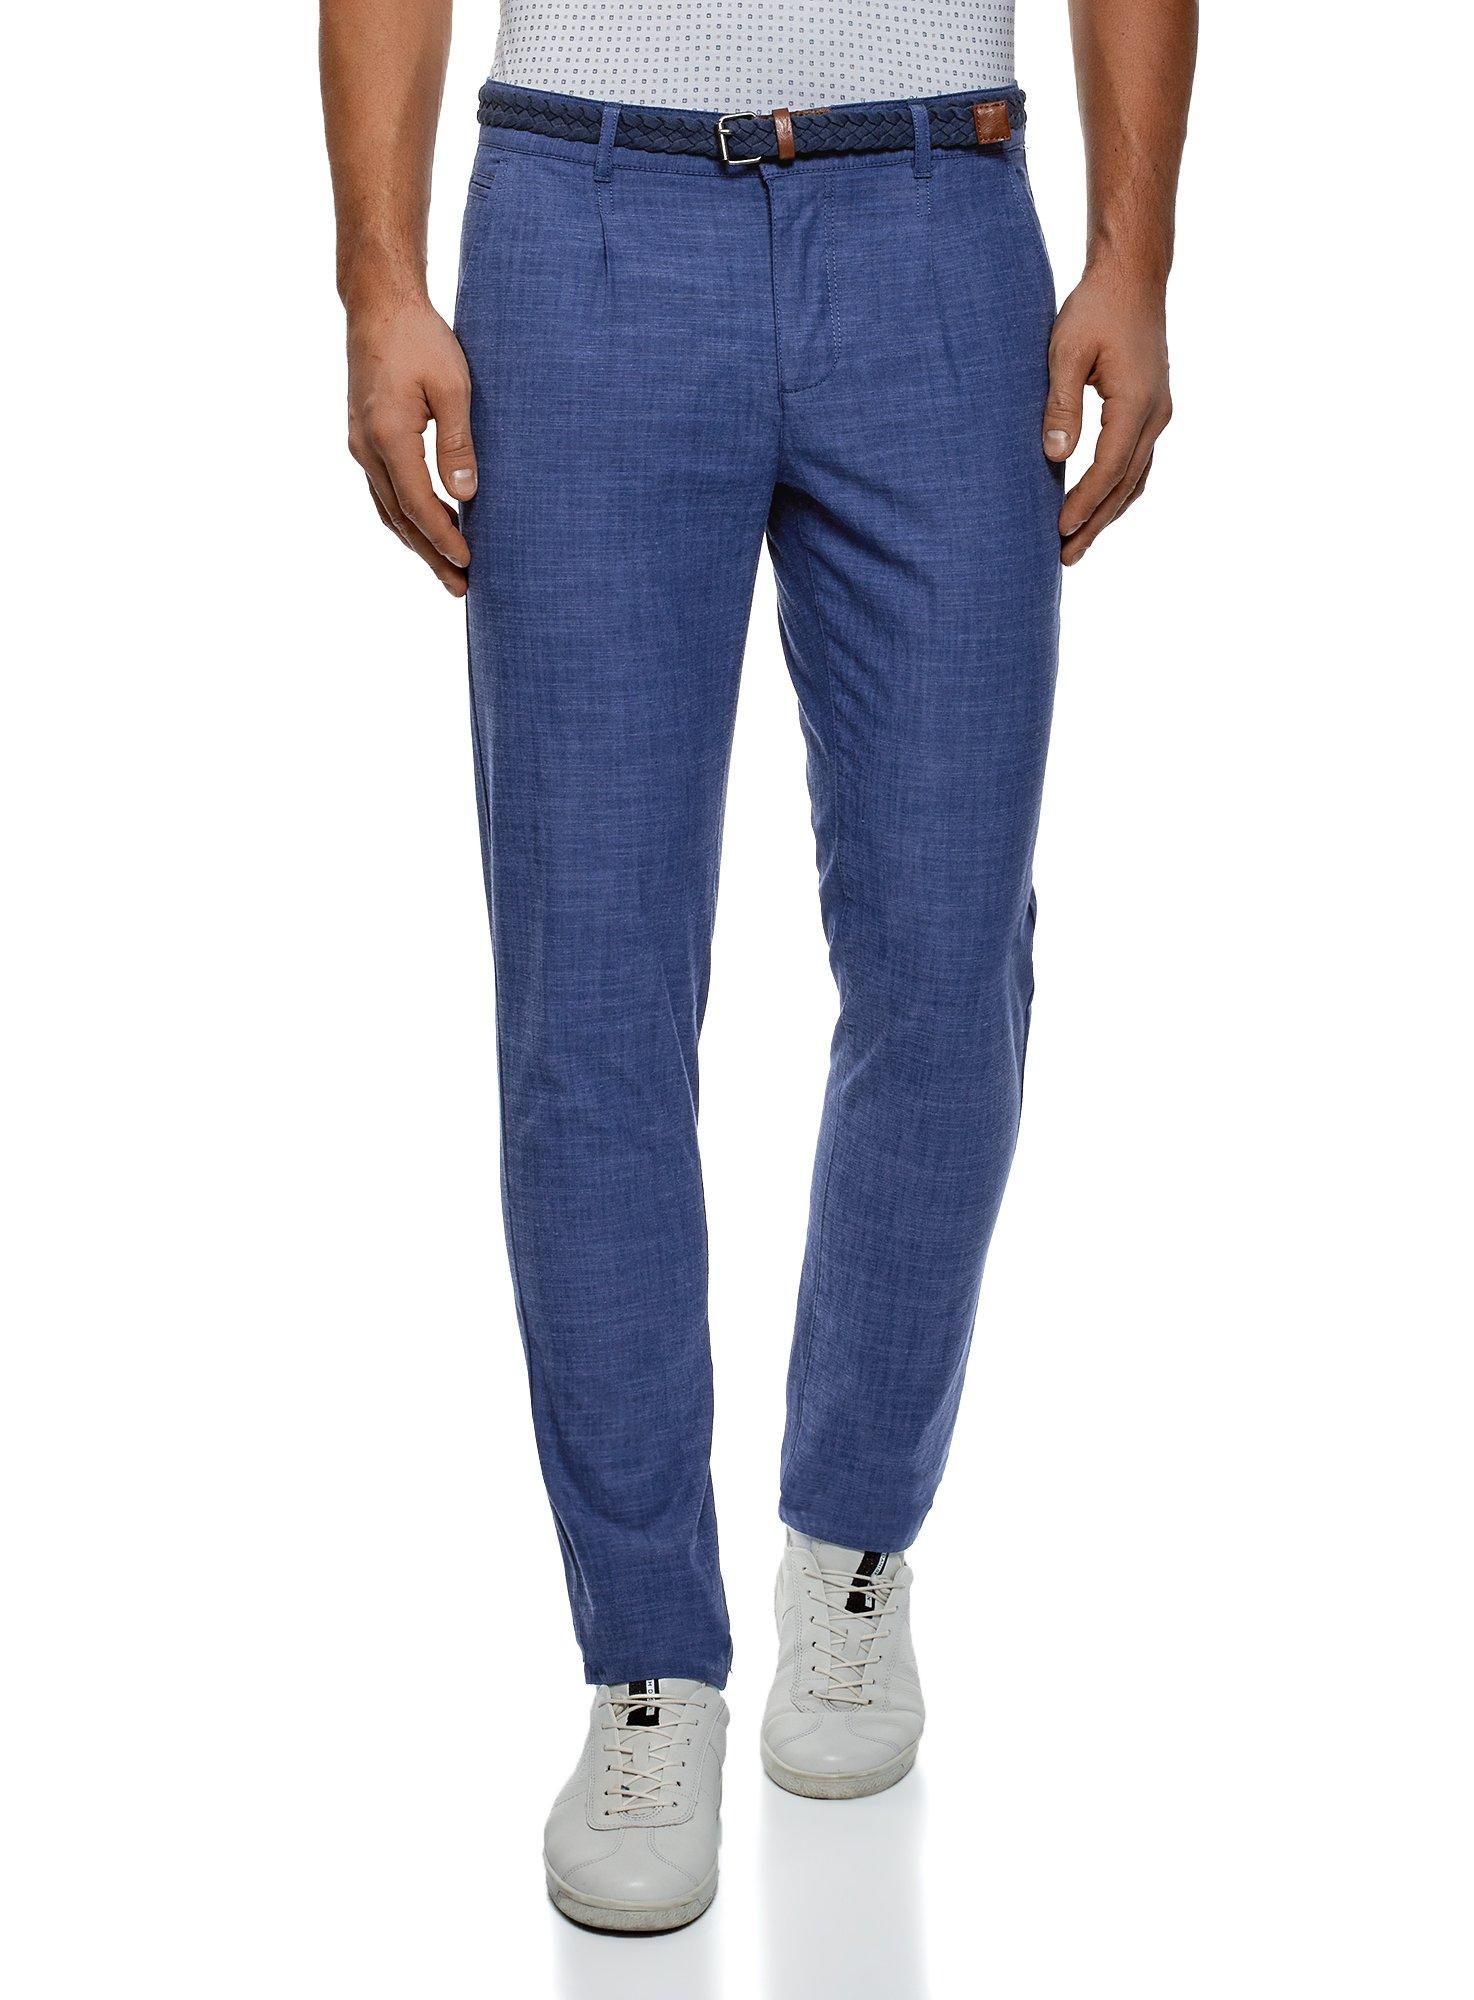 oodji Ultra Men's Cotton Chino Pants, Blue, US 34 / EU 46 / L